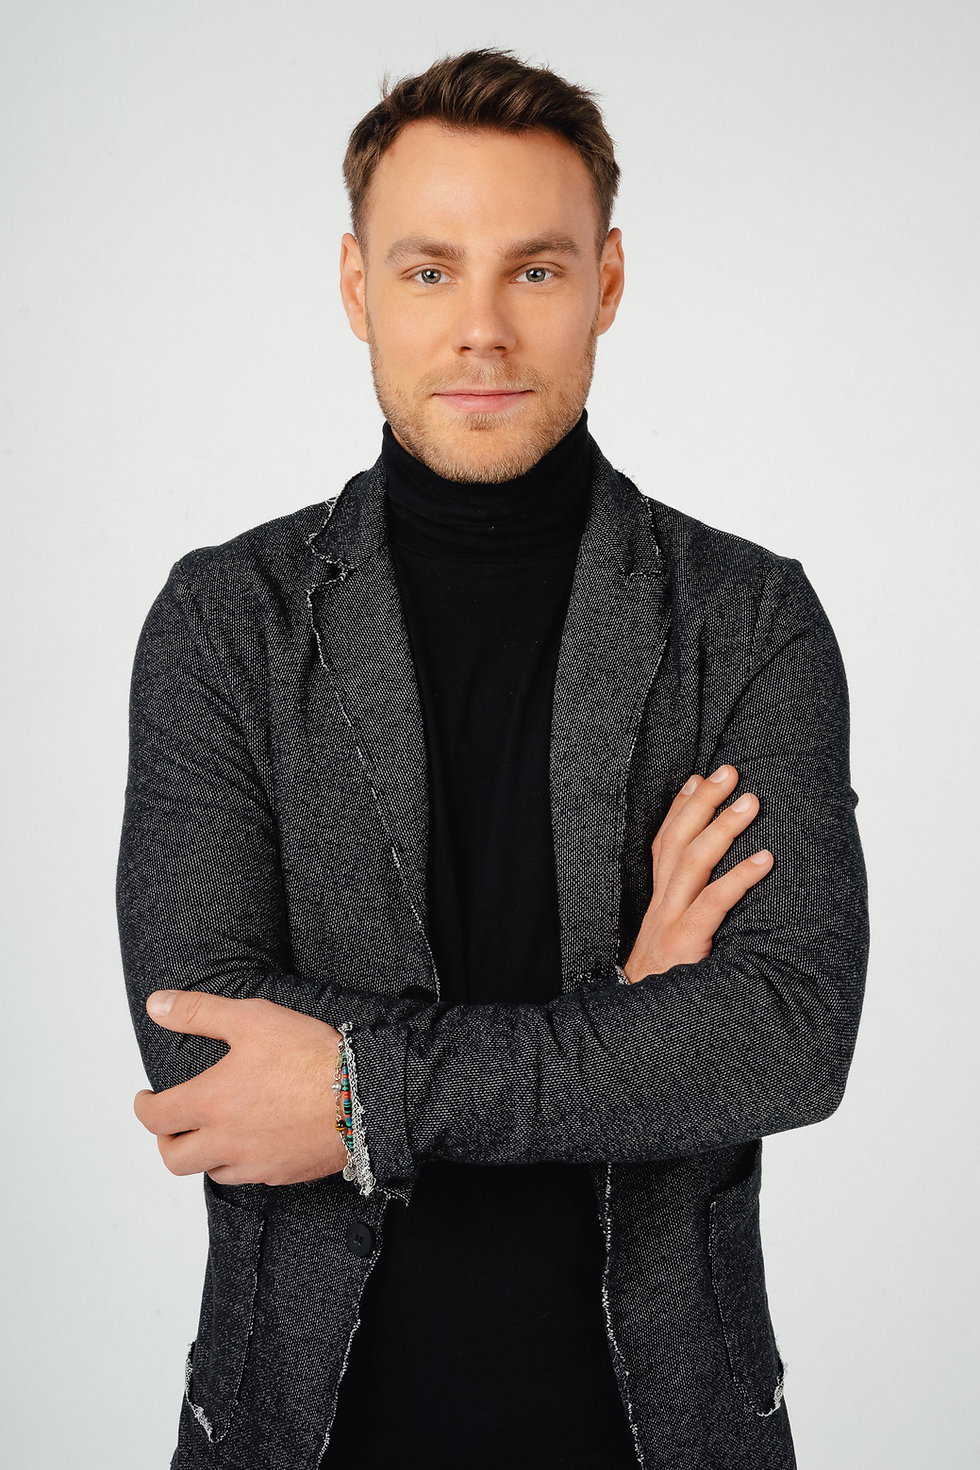 Philip Dimov Business Portrait